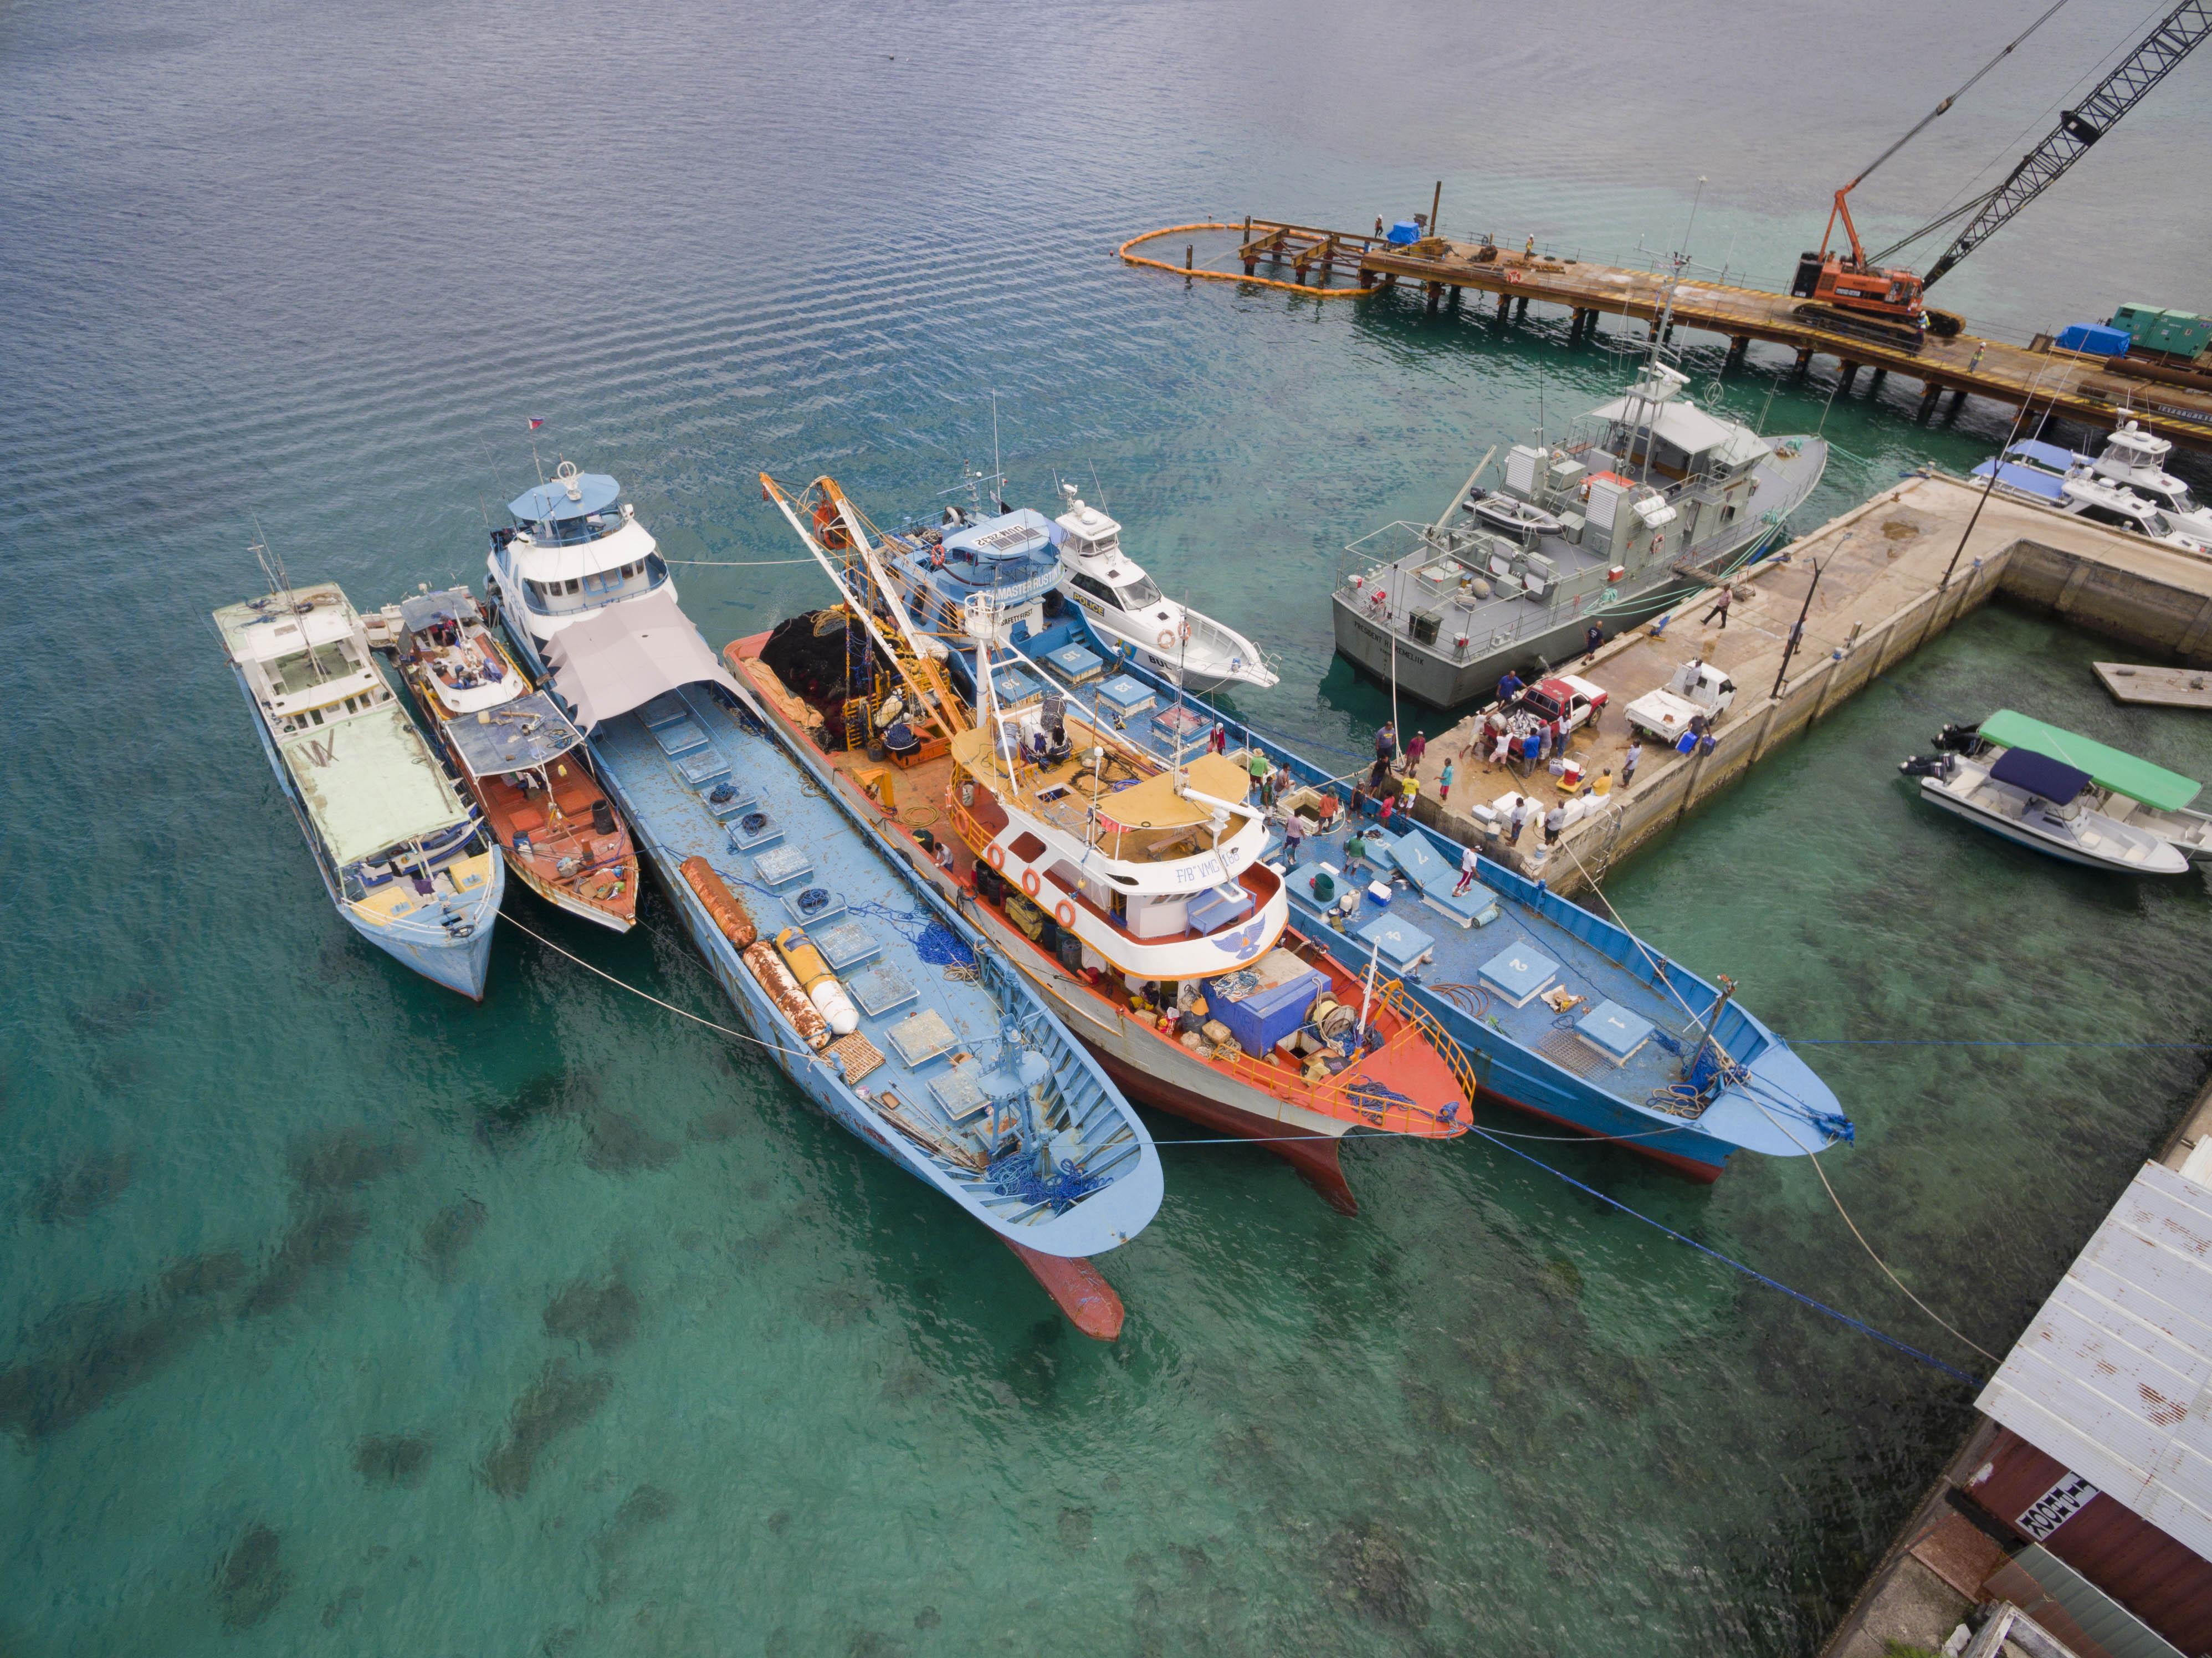 Marine surveillance operation involving 4 countries seizes two Filipino vessels in Palau